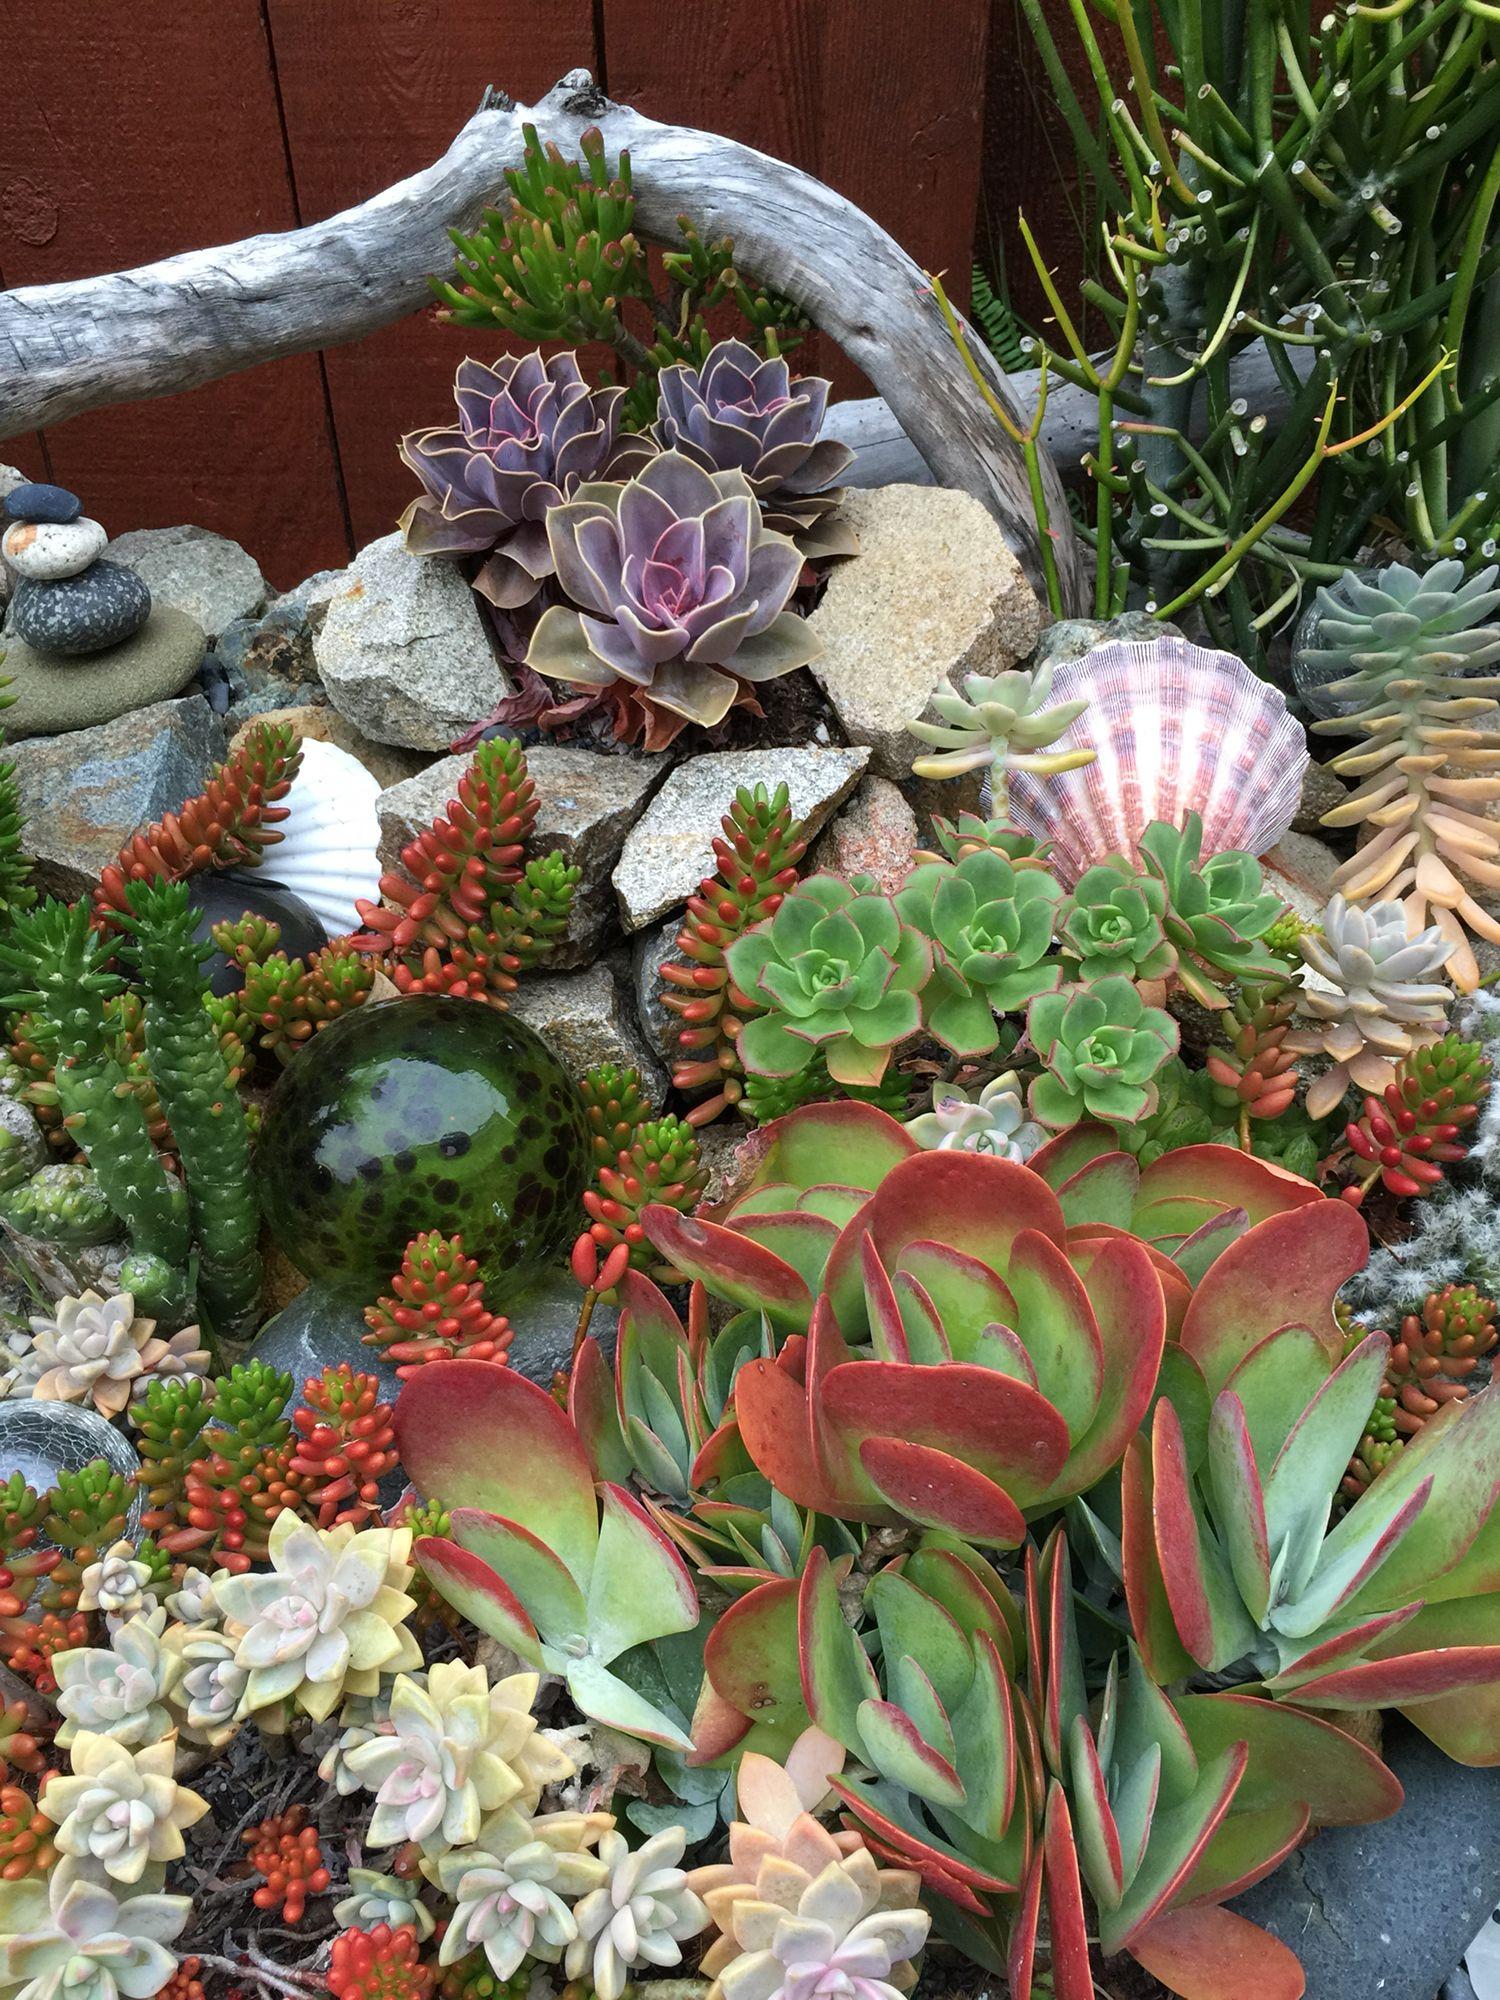 Ocean Theme Landscaping Succulent Landscaping Succulent Landscape Design Succulent Garden Design